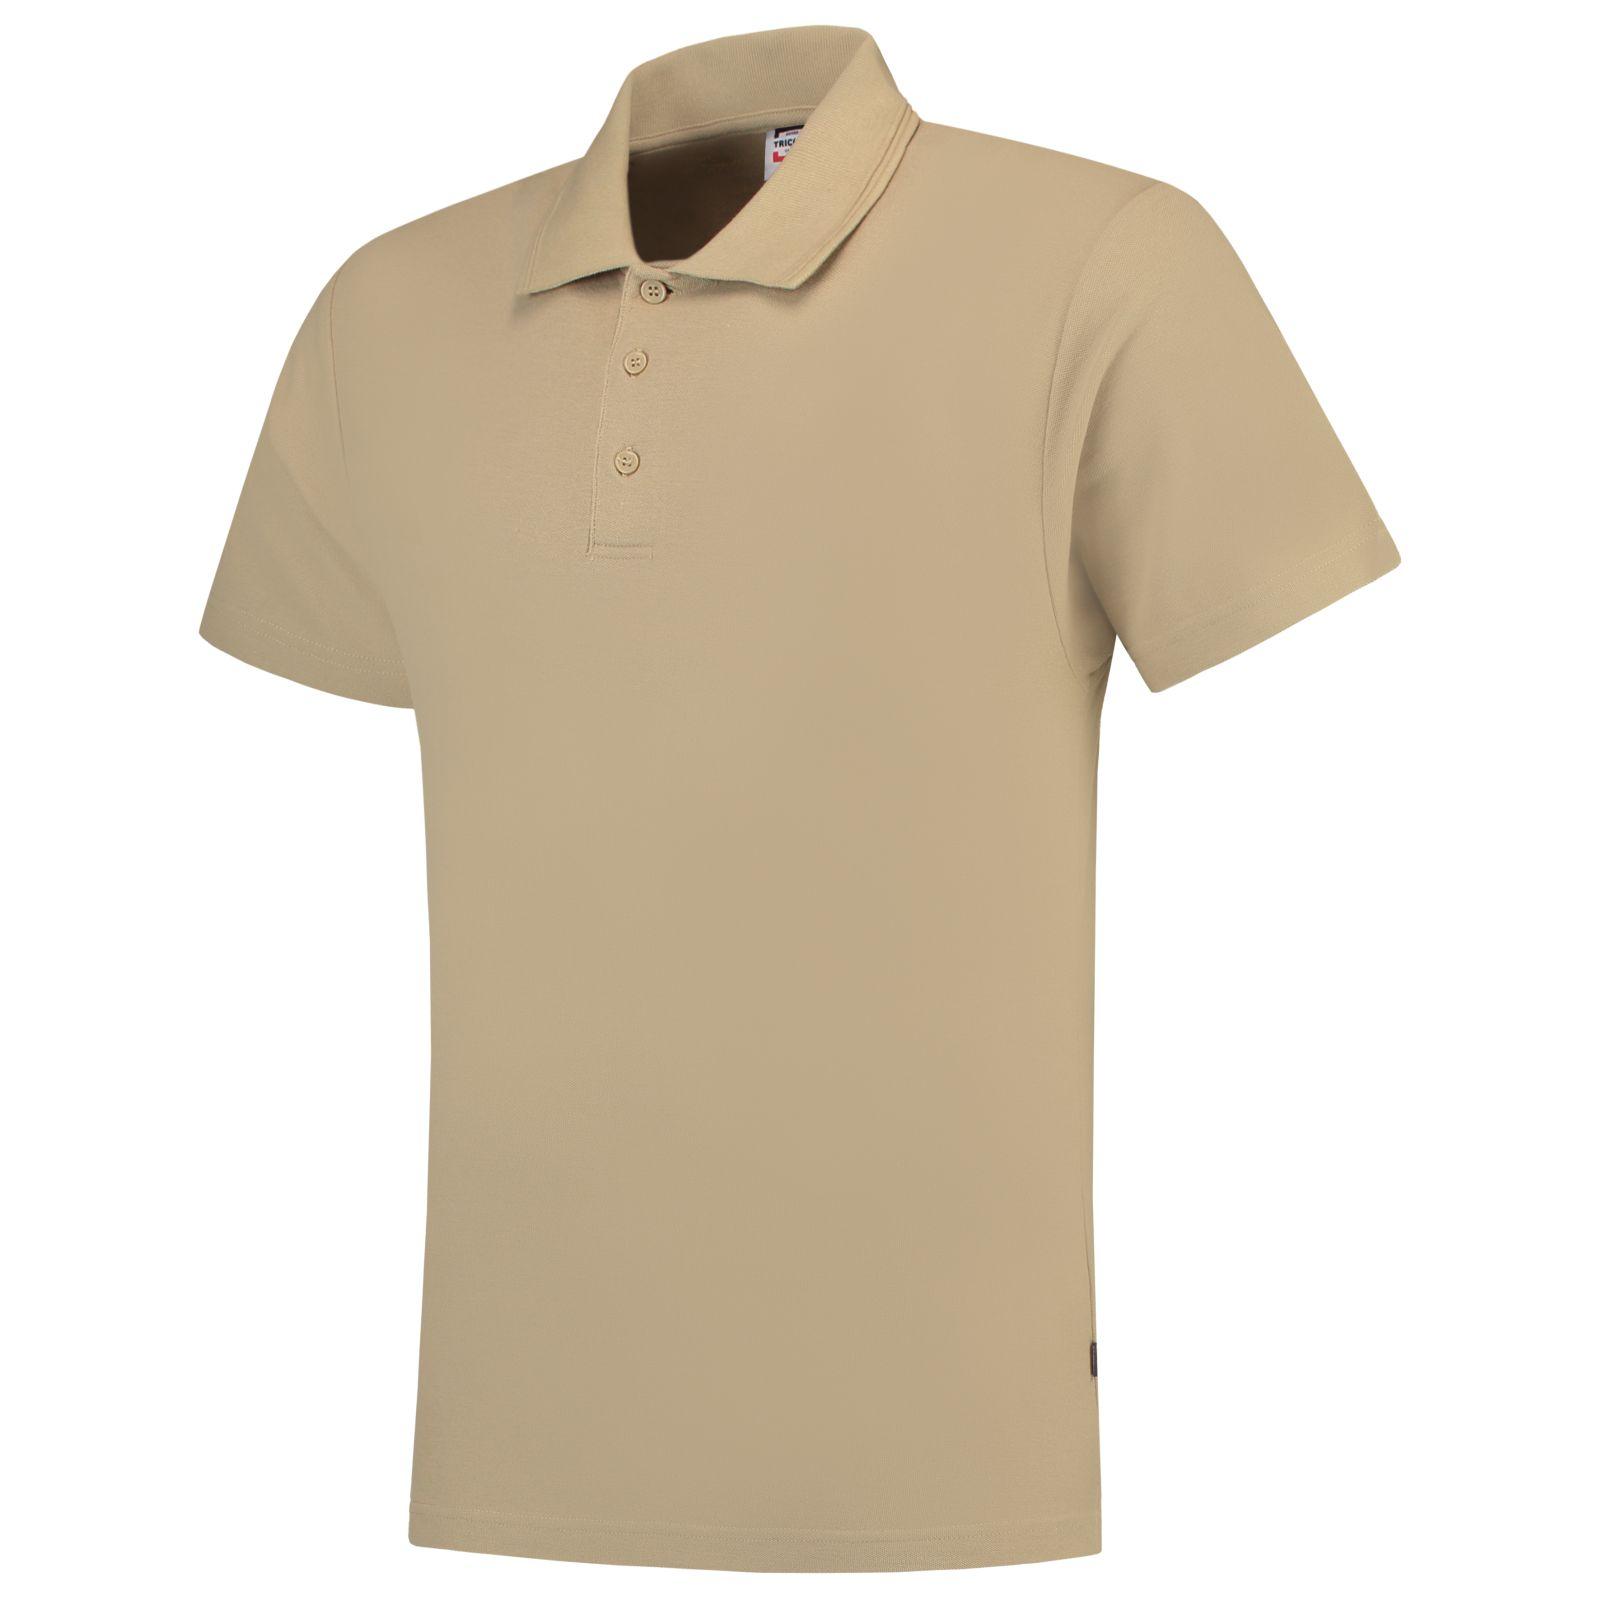 Tricorp Casual Poloshirts 201003- PP180 khaki(Khaki)